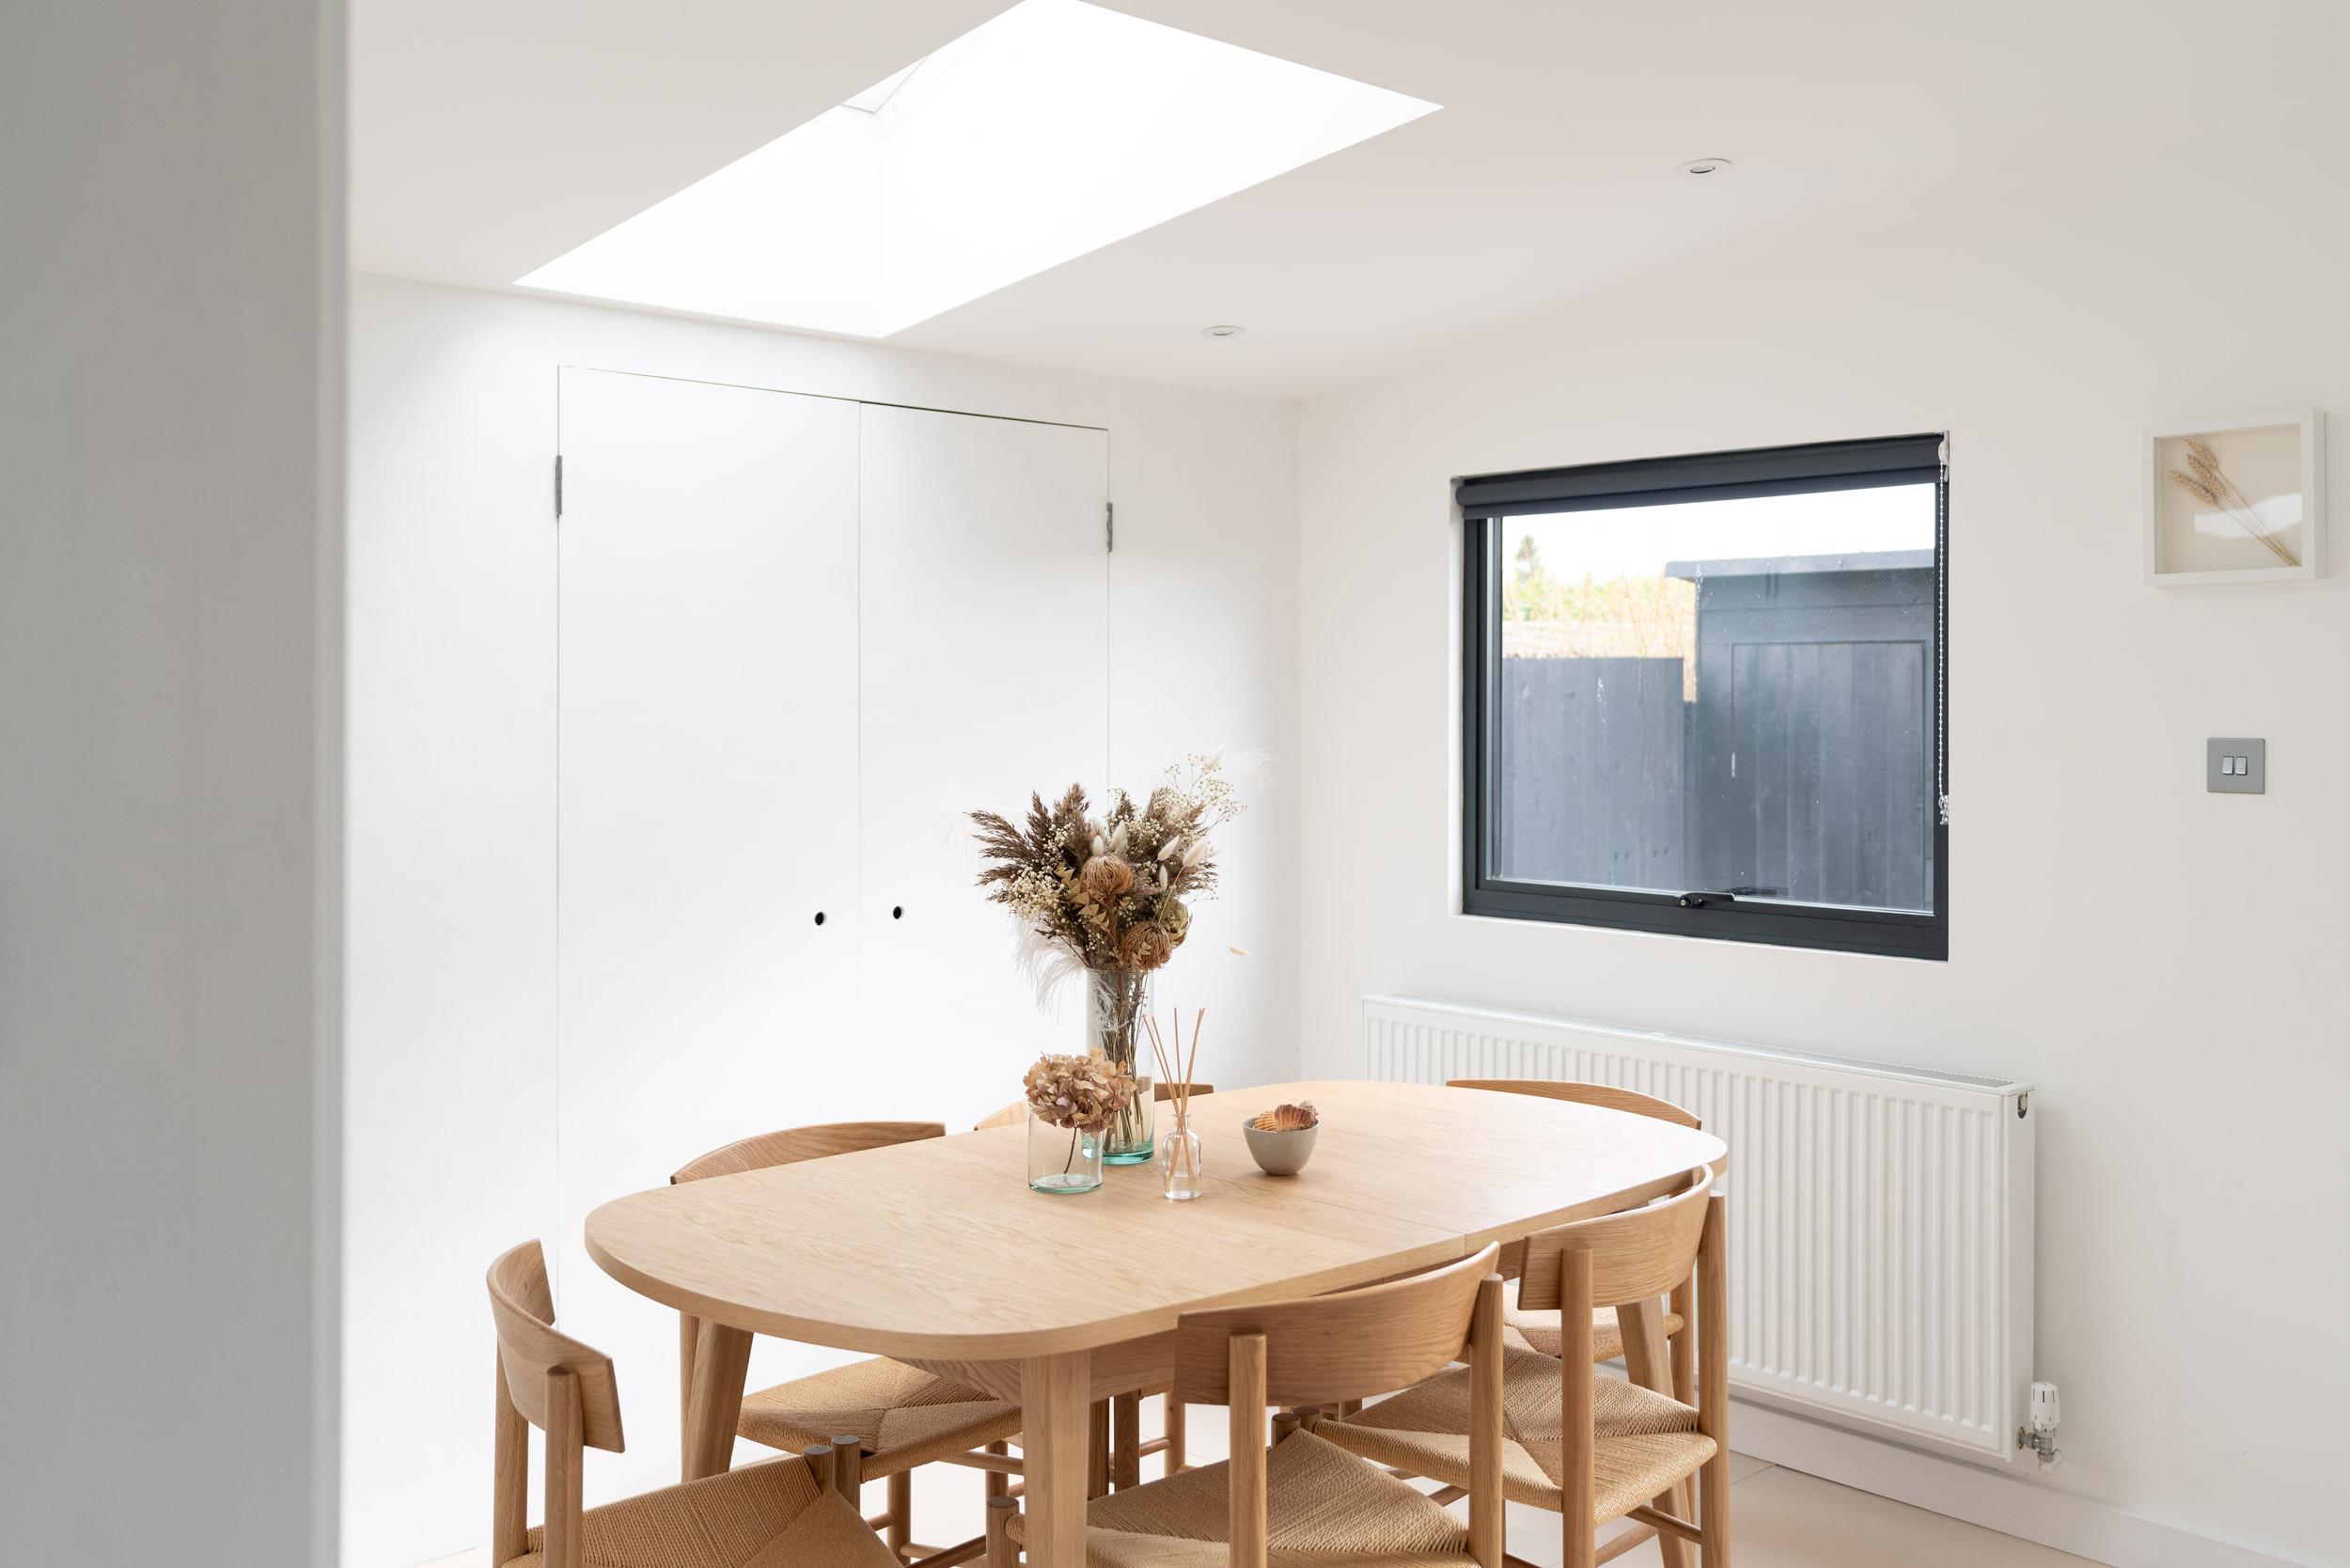 Water-Cabin-Dining-Room-Norfolk-Broads-Habitat-Table.jpg